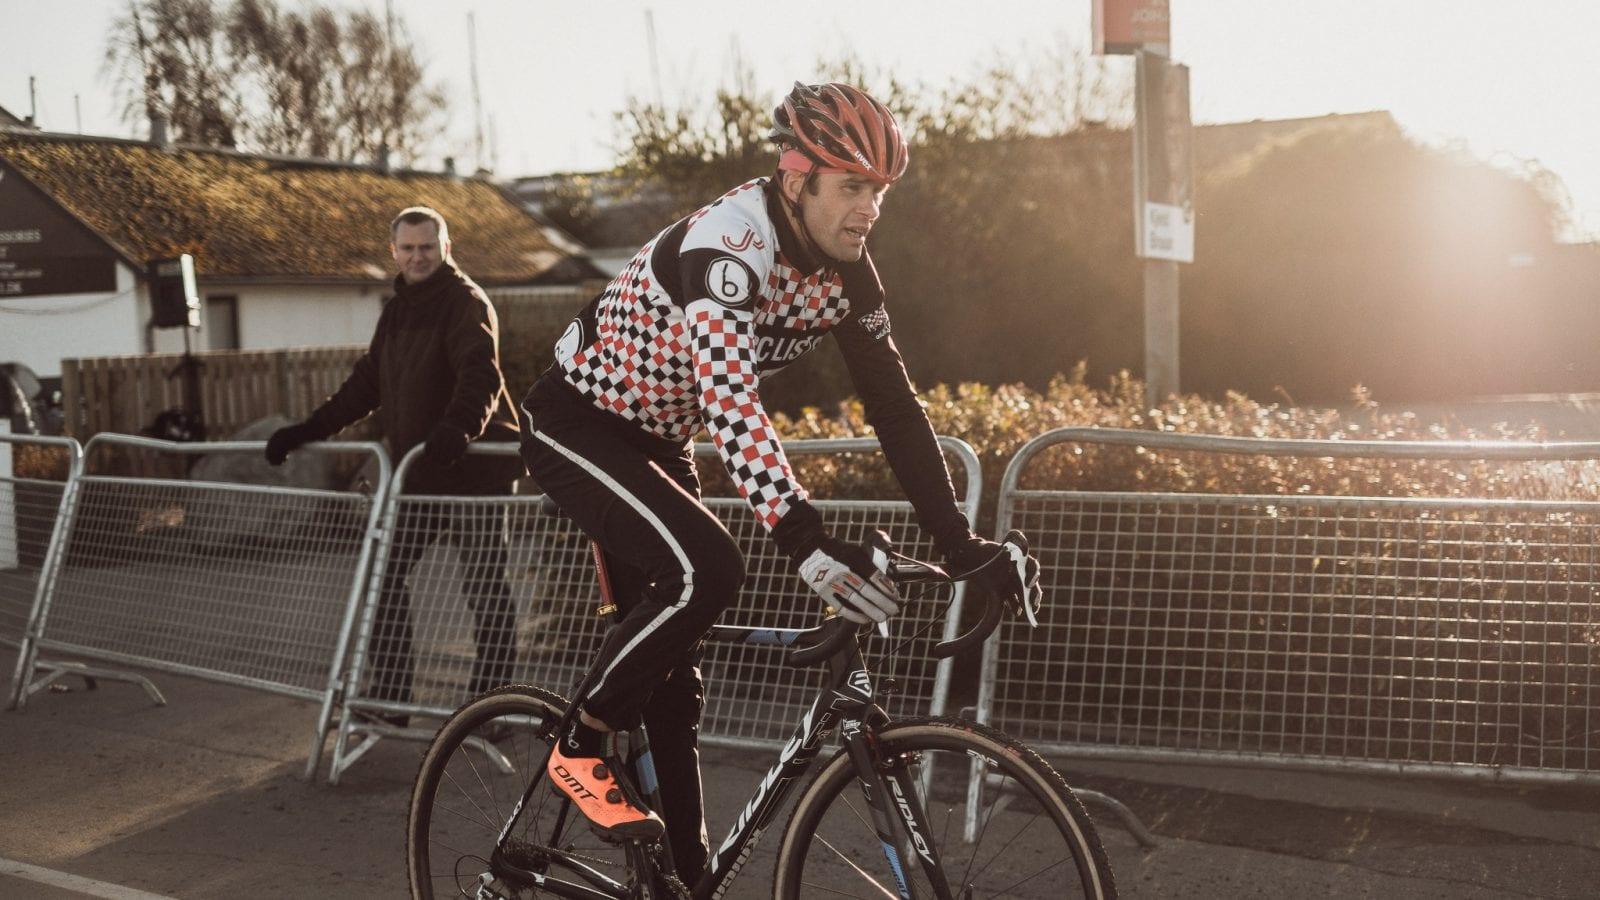 Joachim Parbo 2018 AltomCykling.dk ©Foto Bechbox.dk / Mikkel Bech